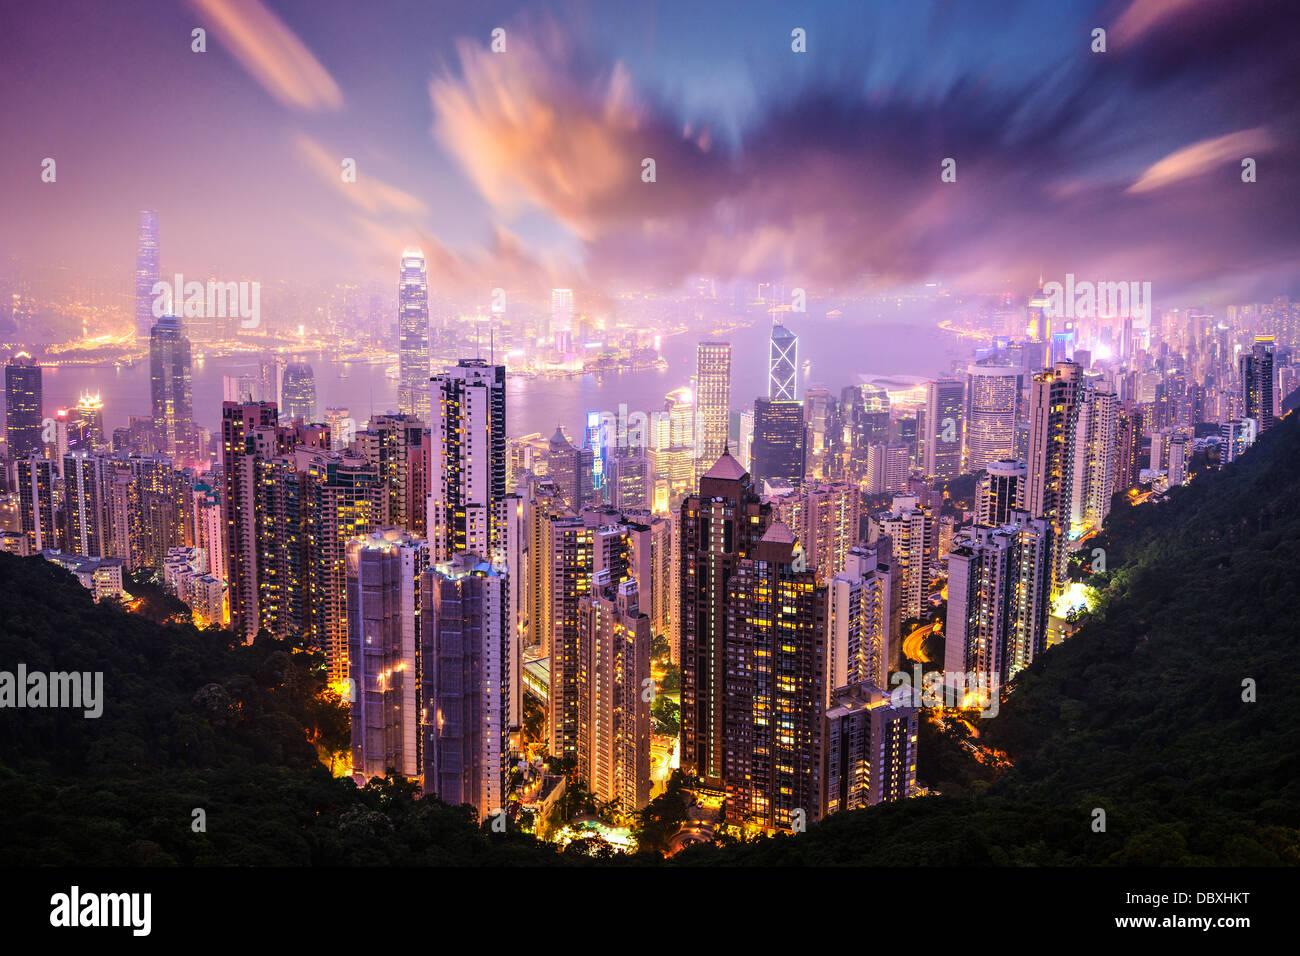 Hong Kong, China skyline from Victoria Peak. - Stock Image